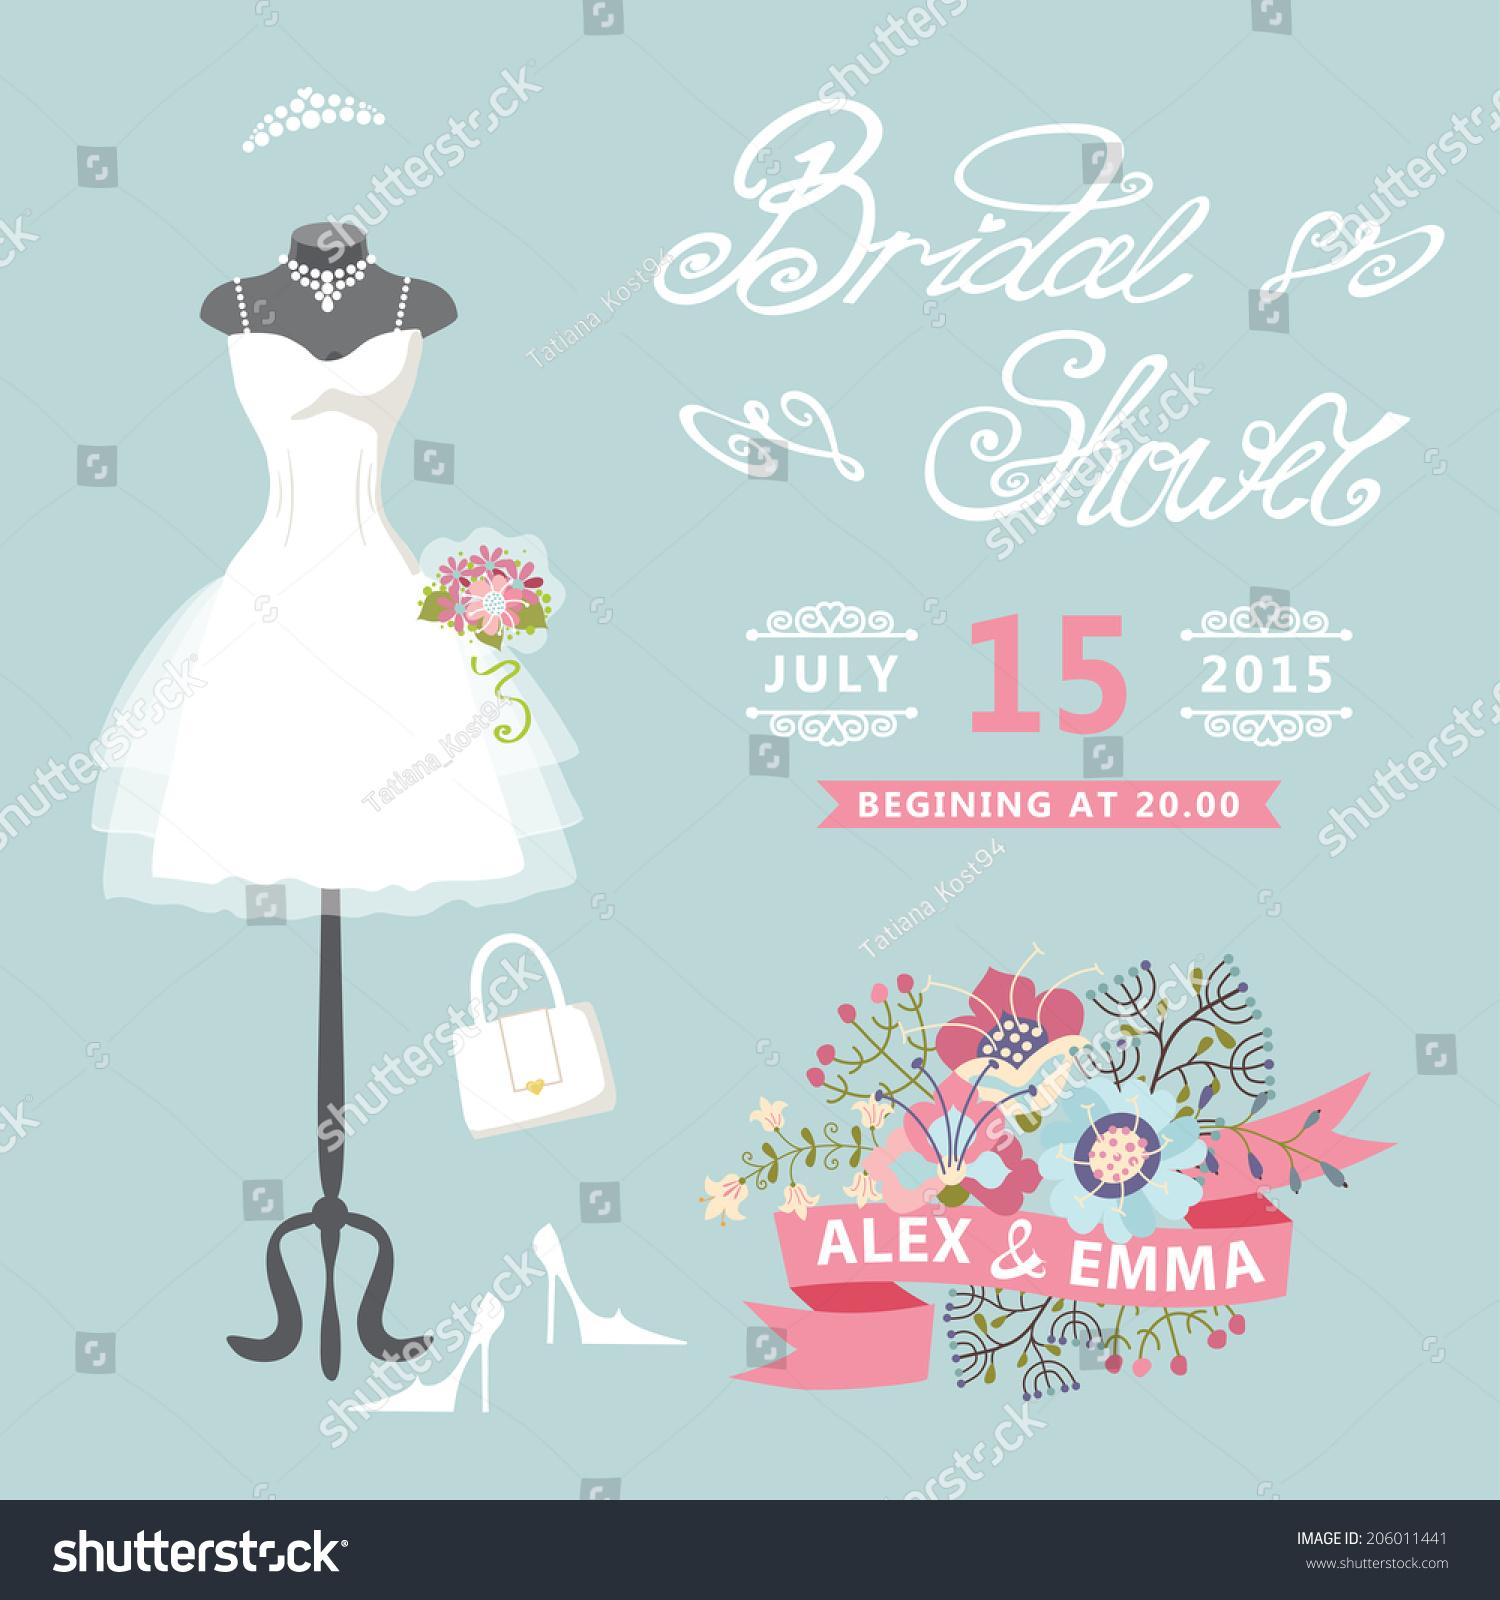 Bridal Shower Card Floral Elements Composition Stock Vector ...